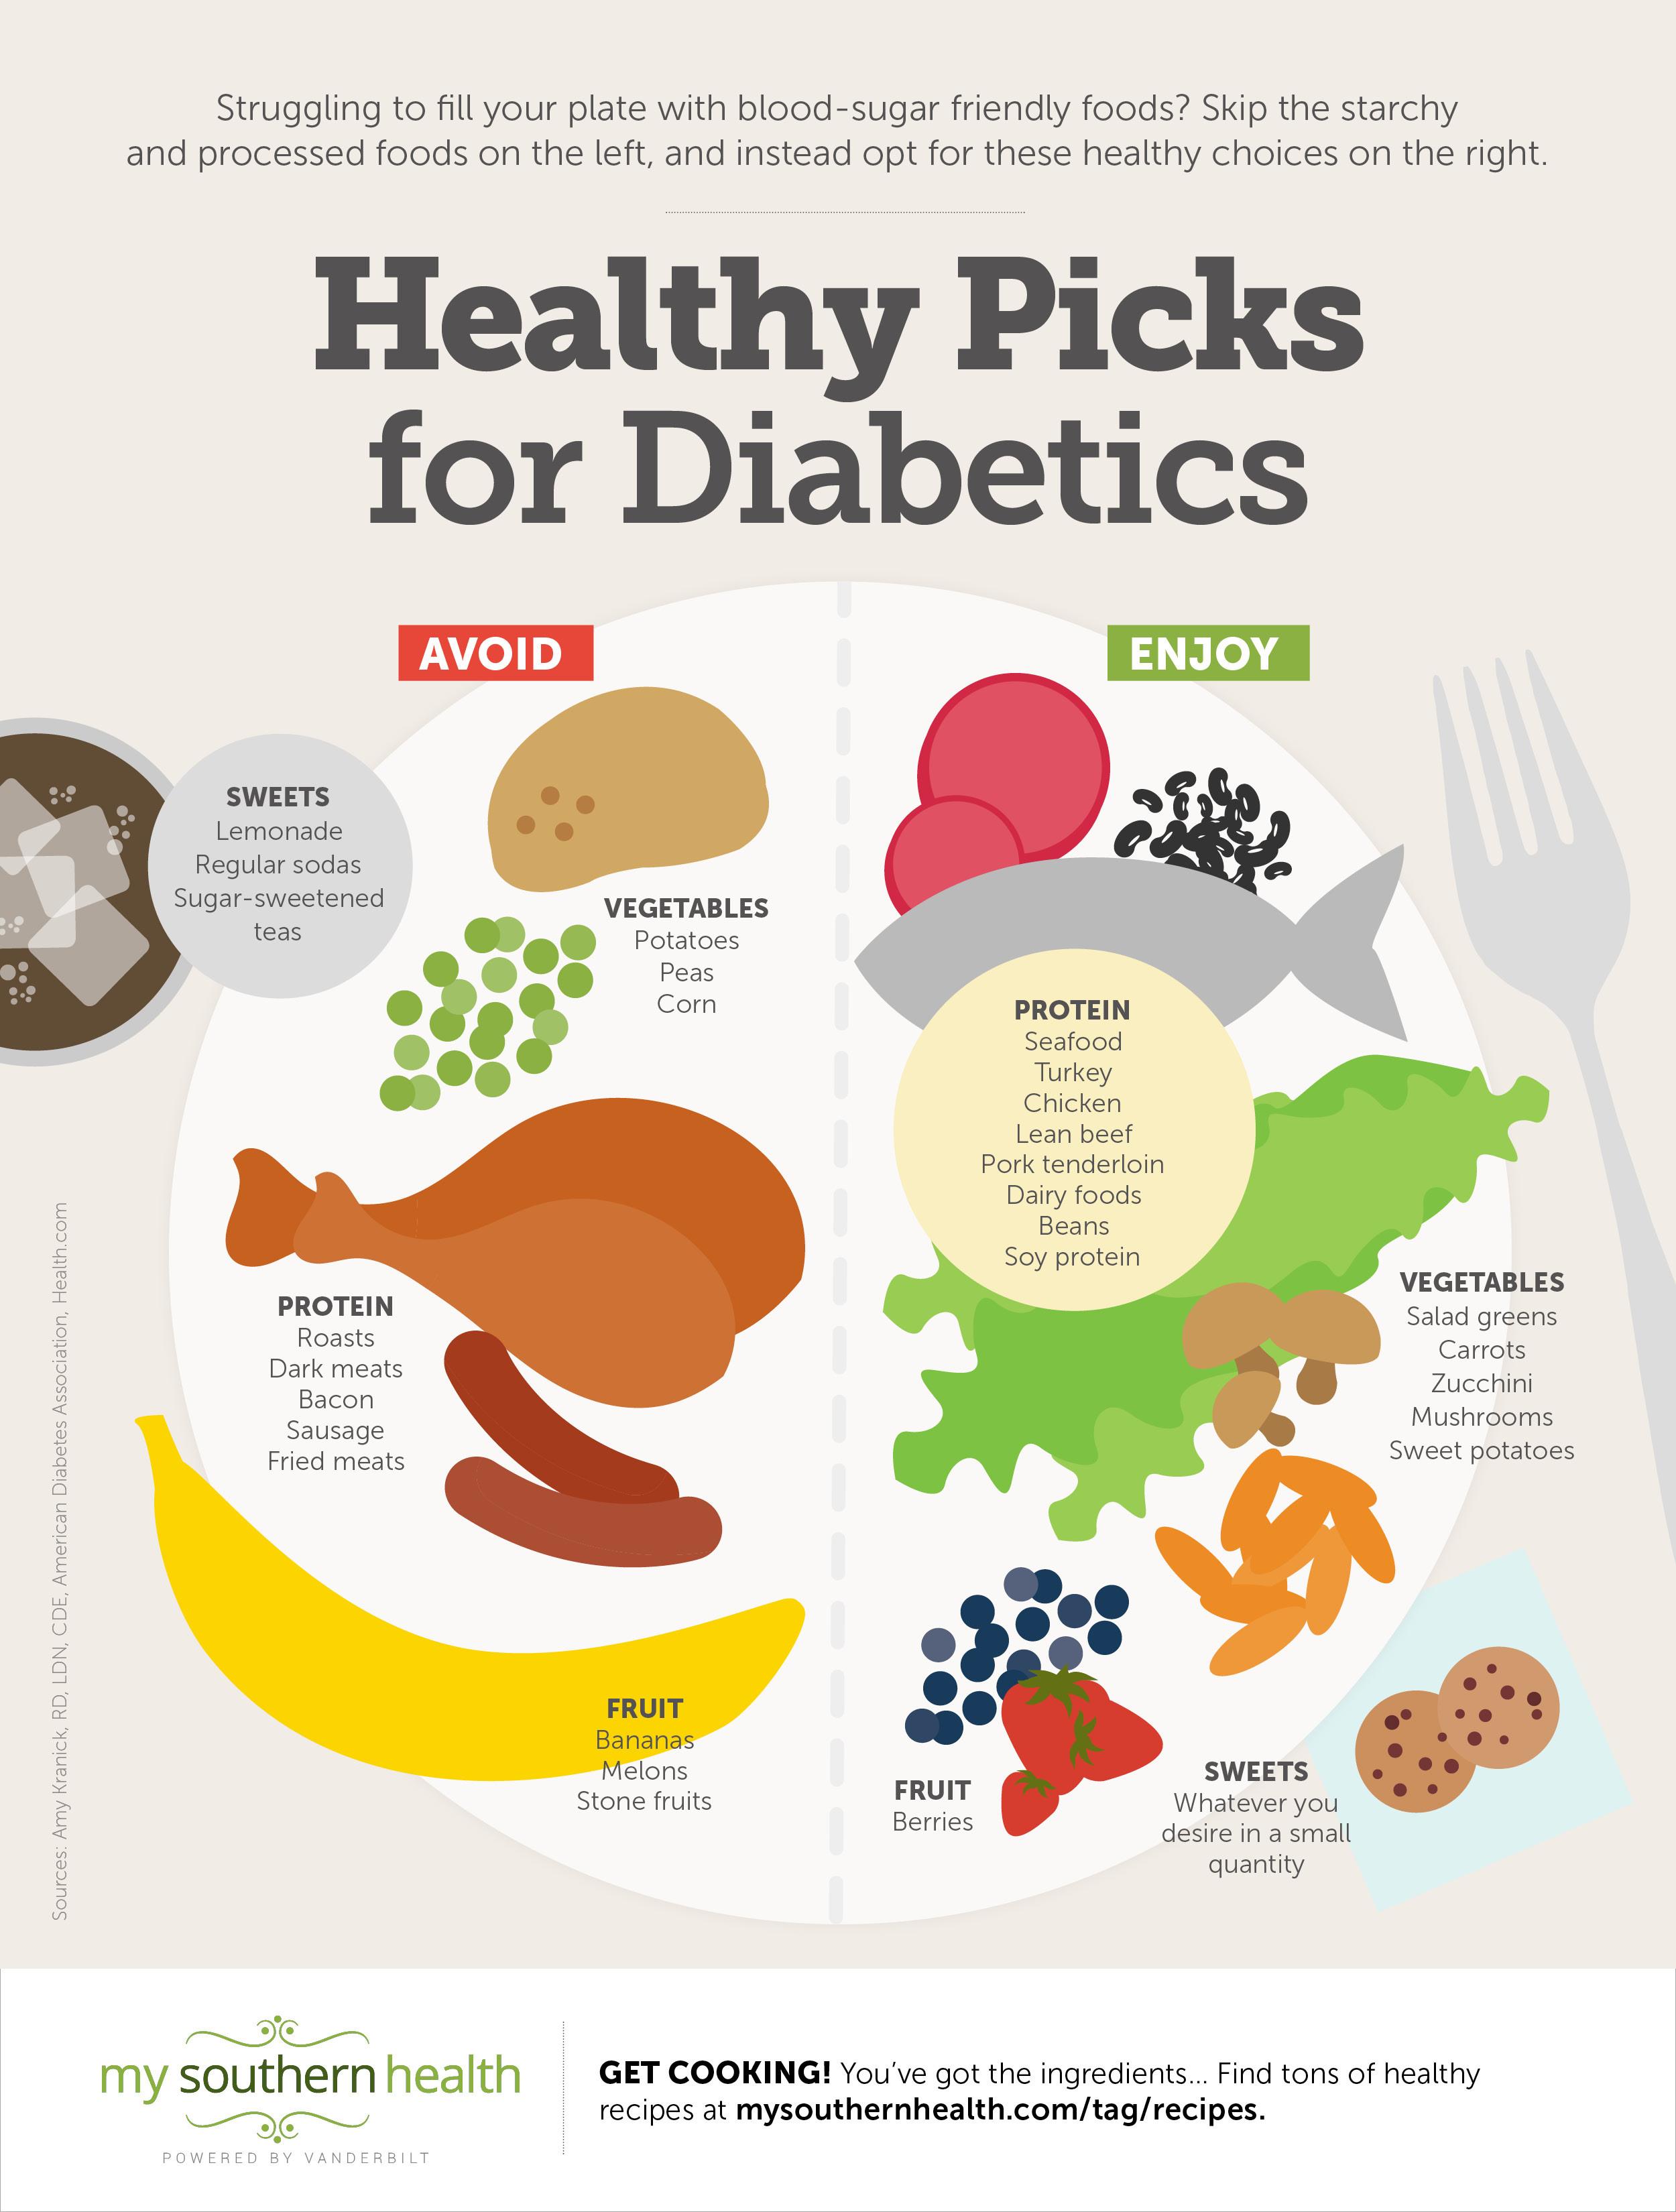 List Of Healthy Snacks For Diabetics  Diabetes Diet Healthy Foods for Diabetics [Infographic]